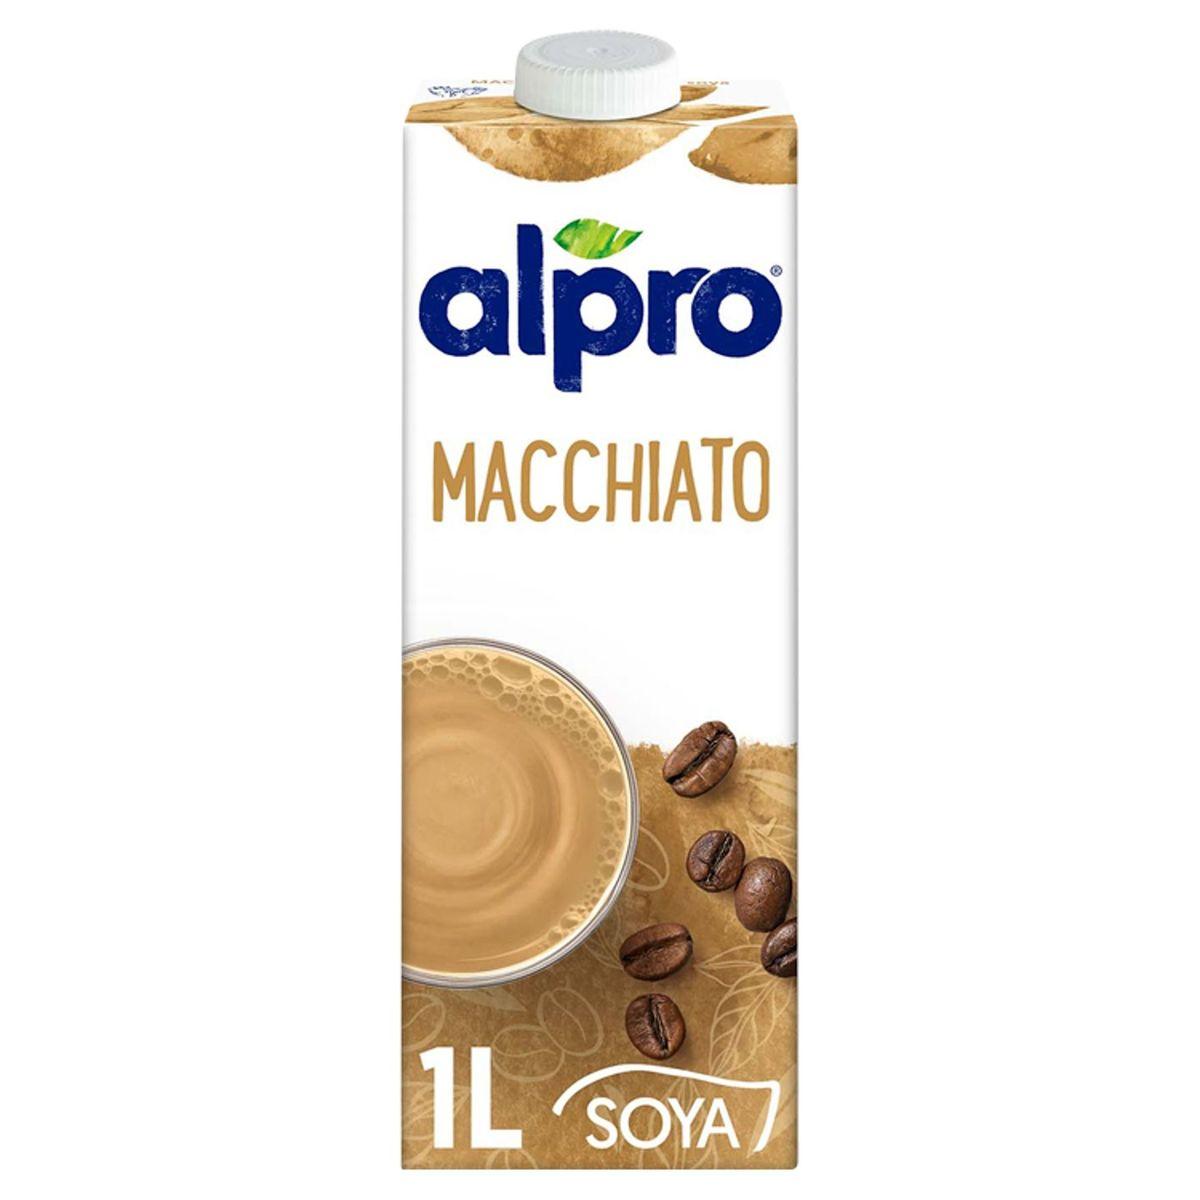 Alpro Macchiato Boisson à base de Soja 1 L